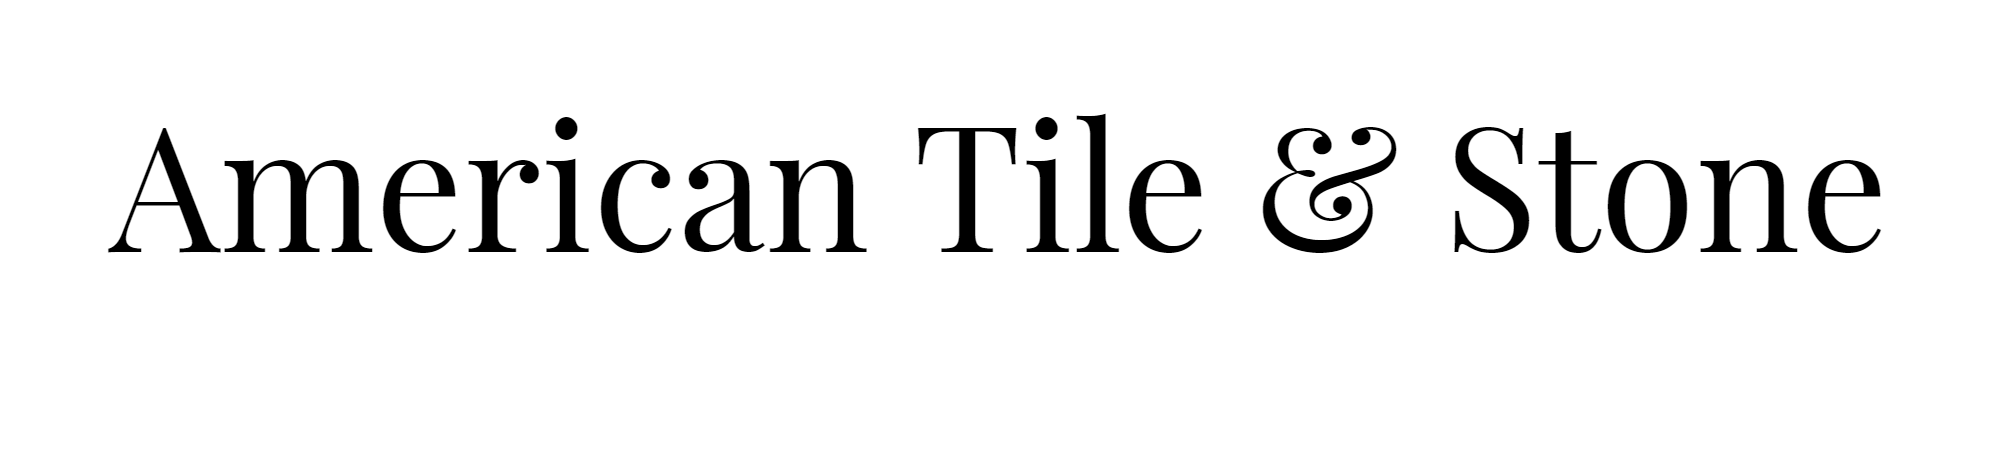 american tile stone